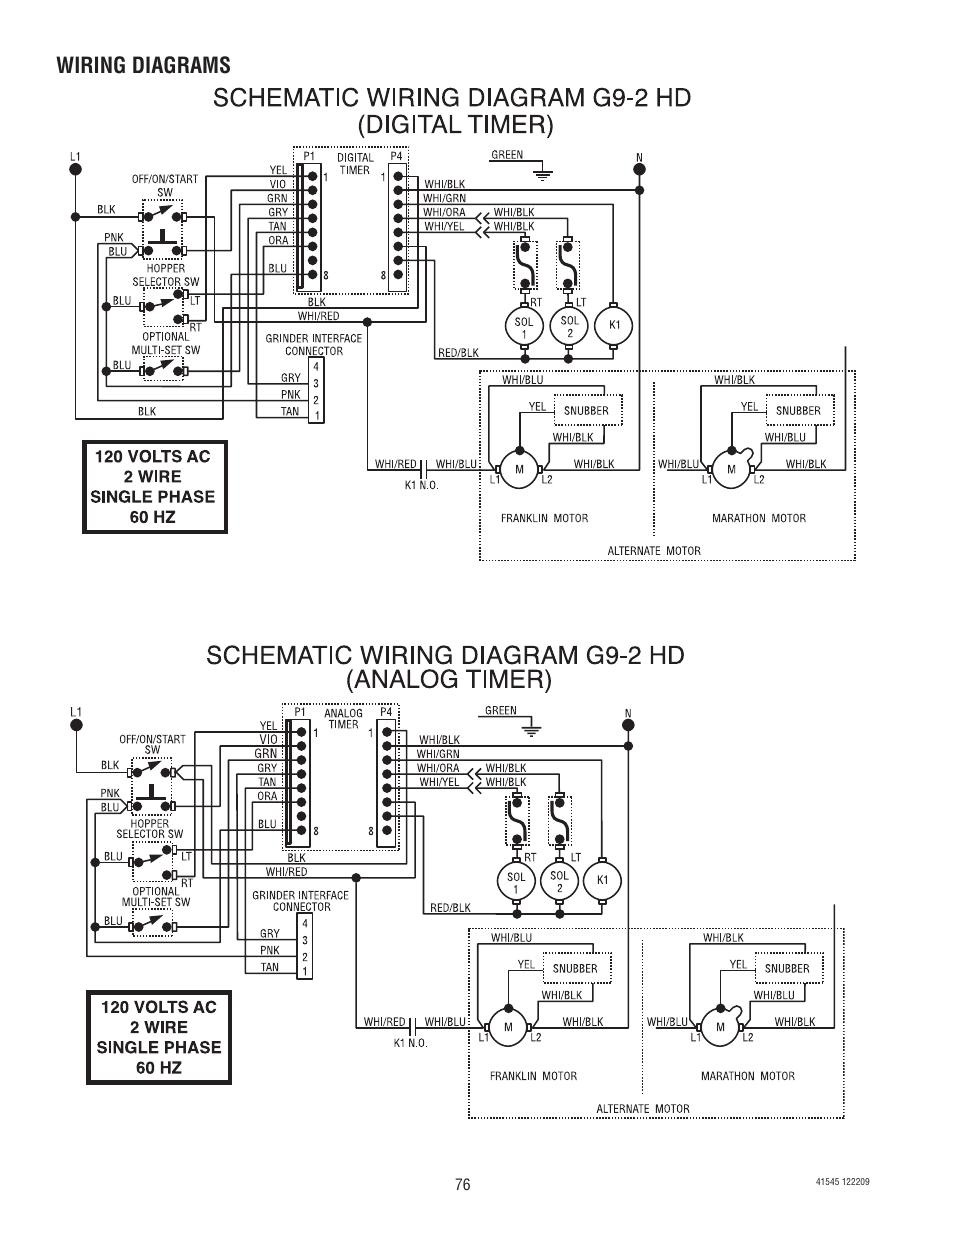 hight resolution of  bunn g9 2t dbc page76 g9 wiring diagram lighting diagrams honda motorcycle repair at cita